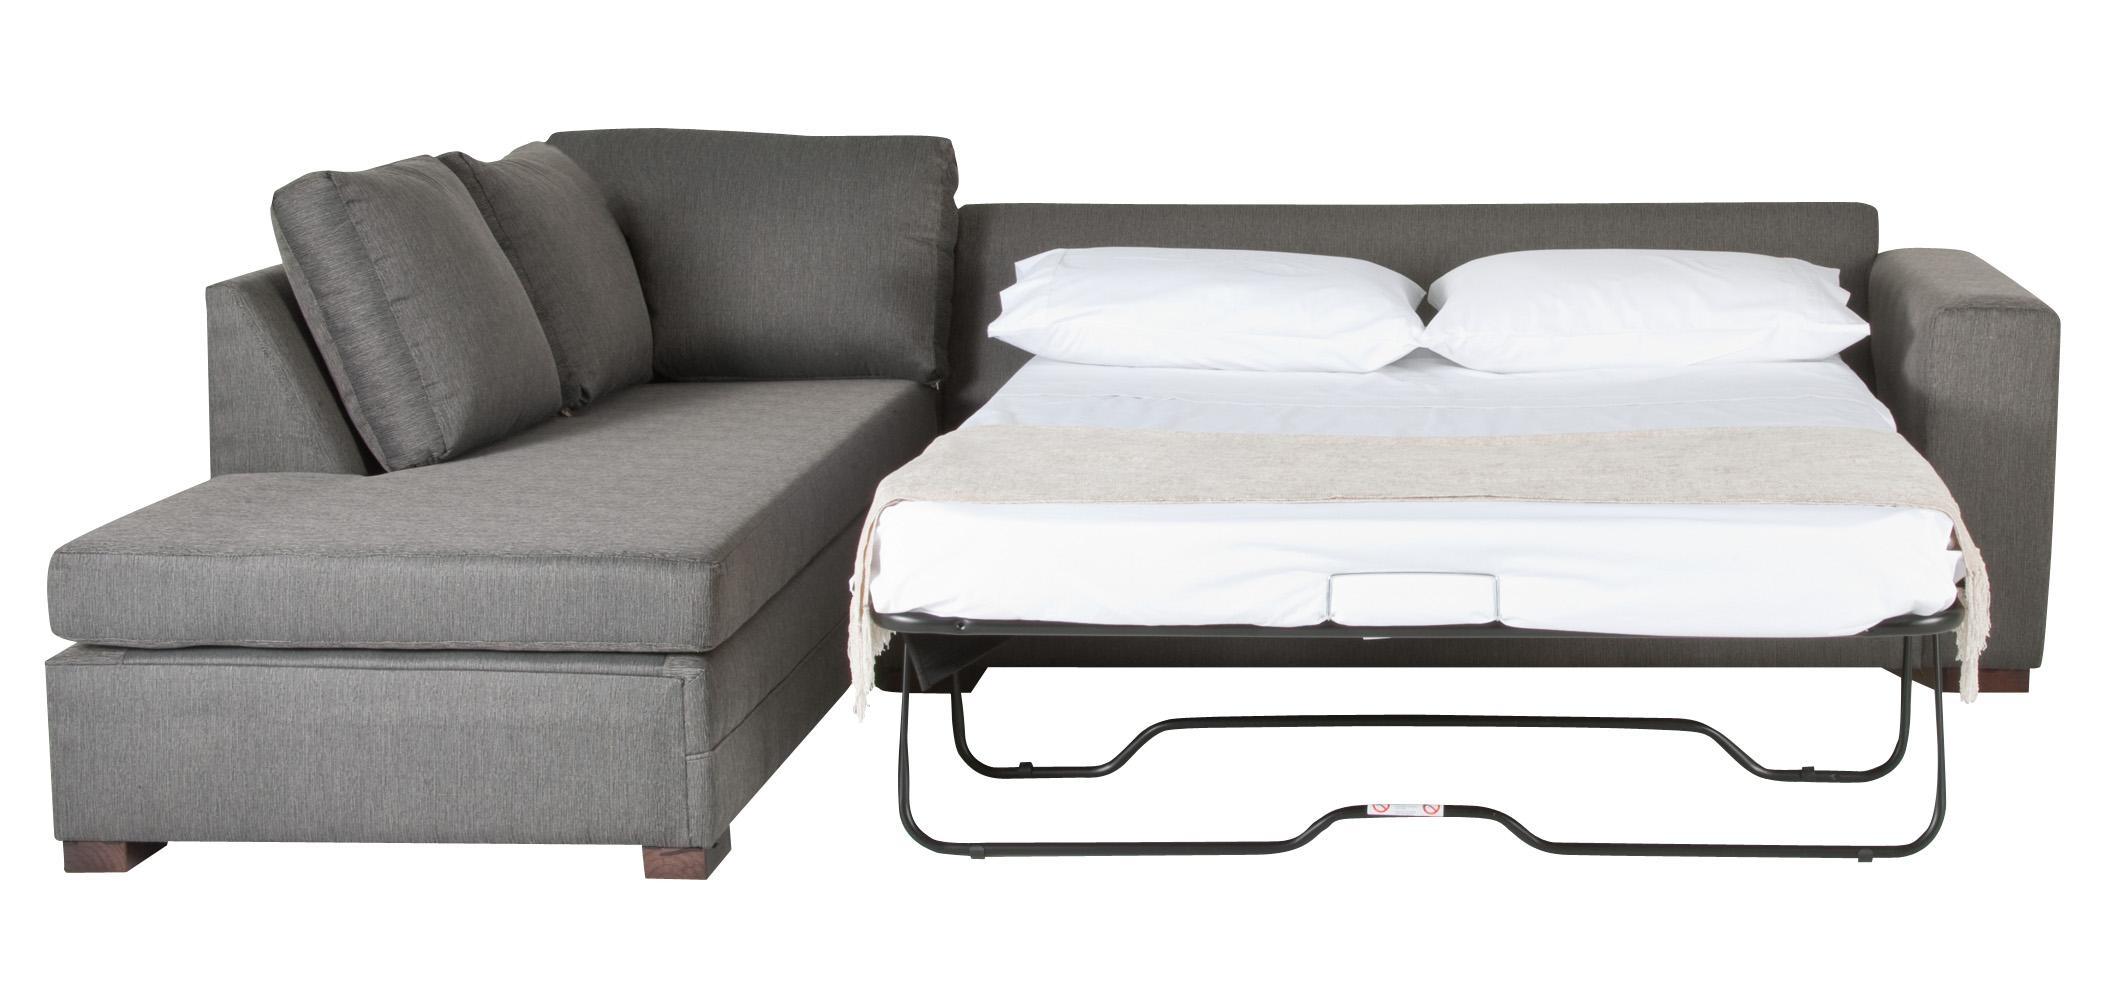 Sectional Sleeper Sofa Ikea – Interior Design In Ikea Sectional Sleeper Sofa (View 7 of 20)